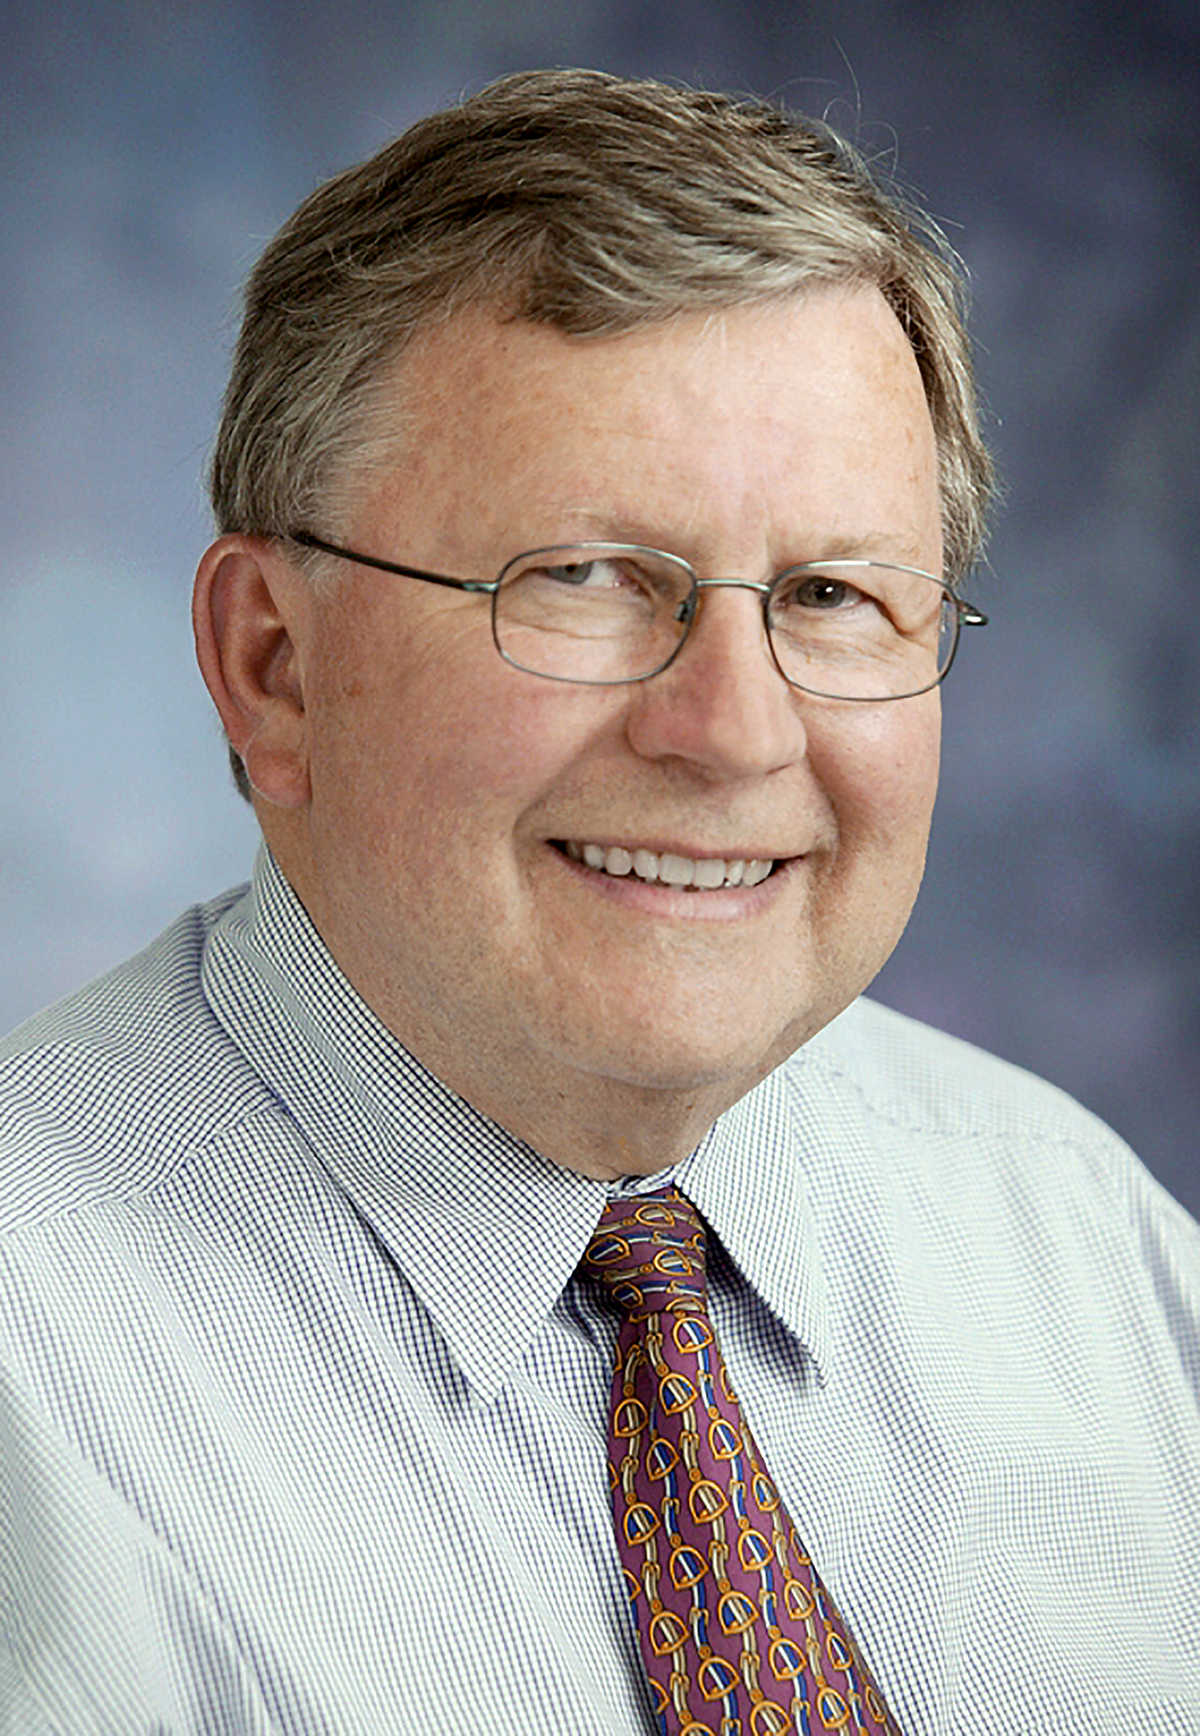 Dr. Gordon Johnson, Program Director, Mechanical Engineering Division